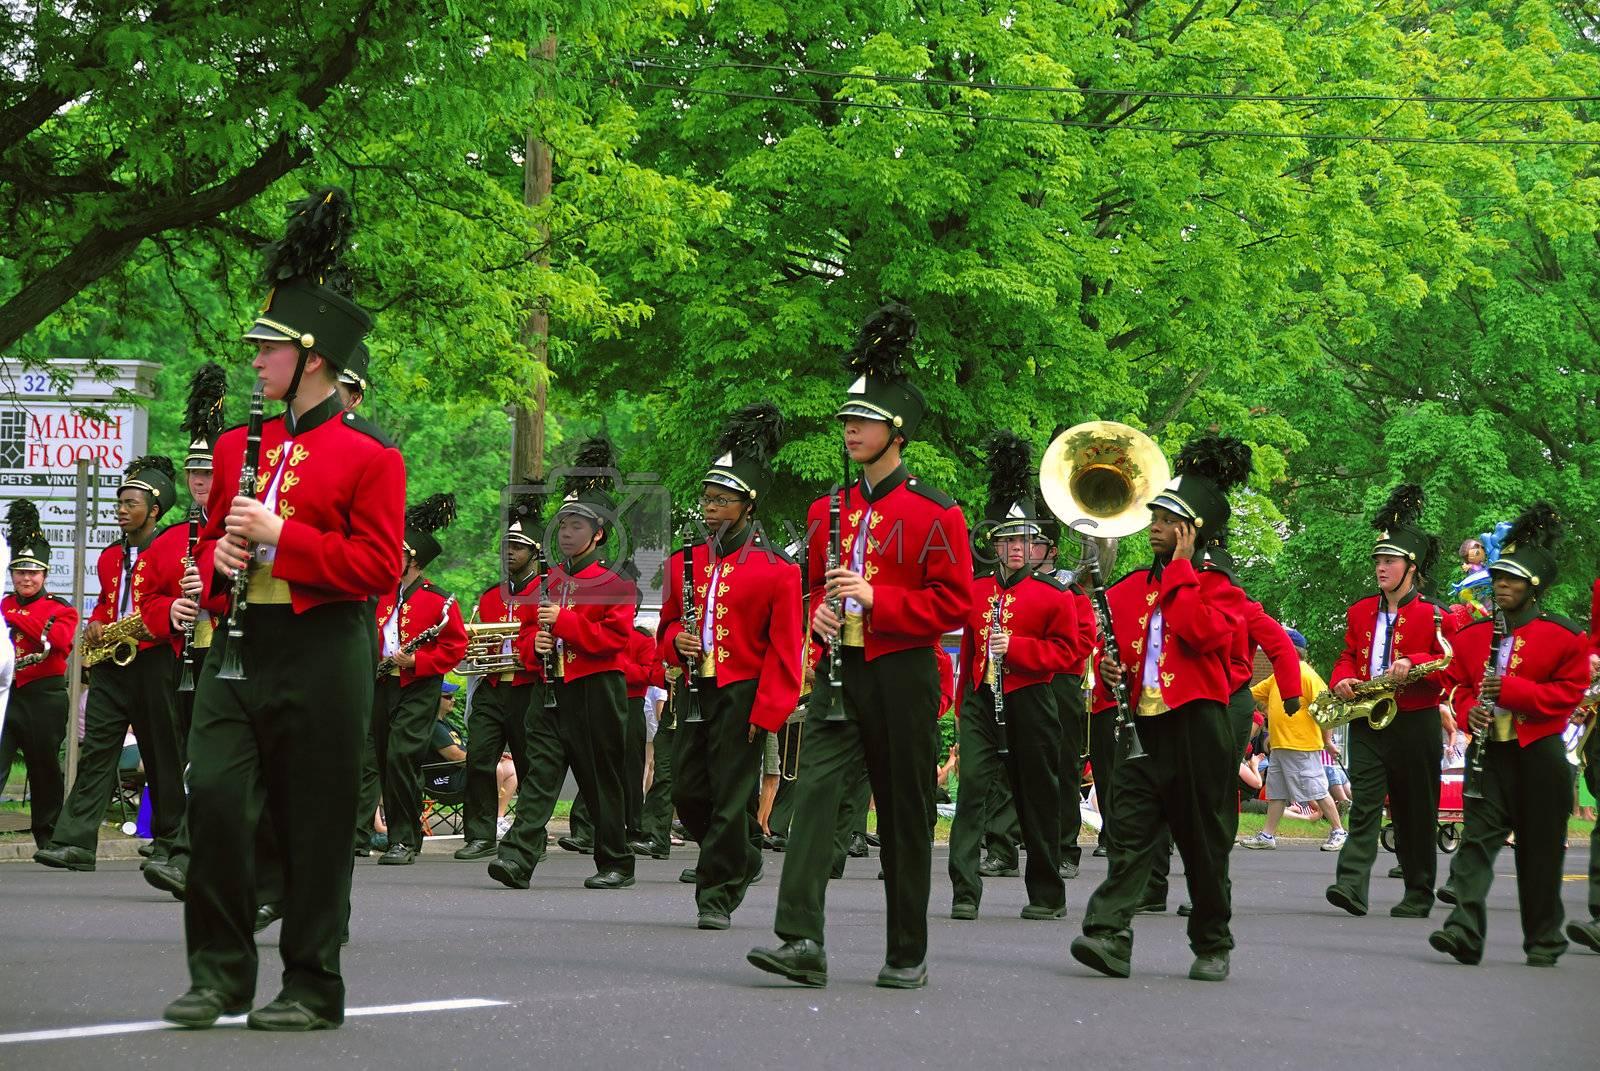 A grounp of band men playing at a local parade